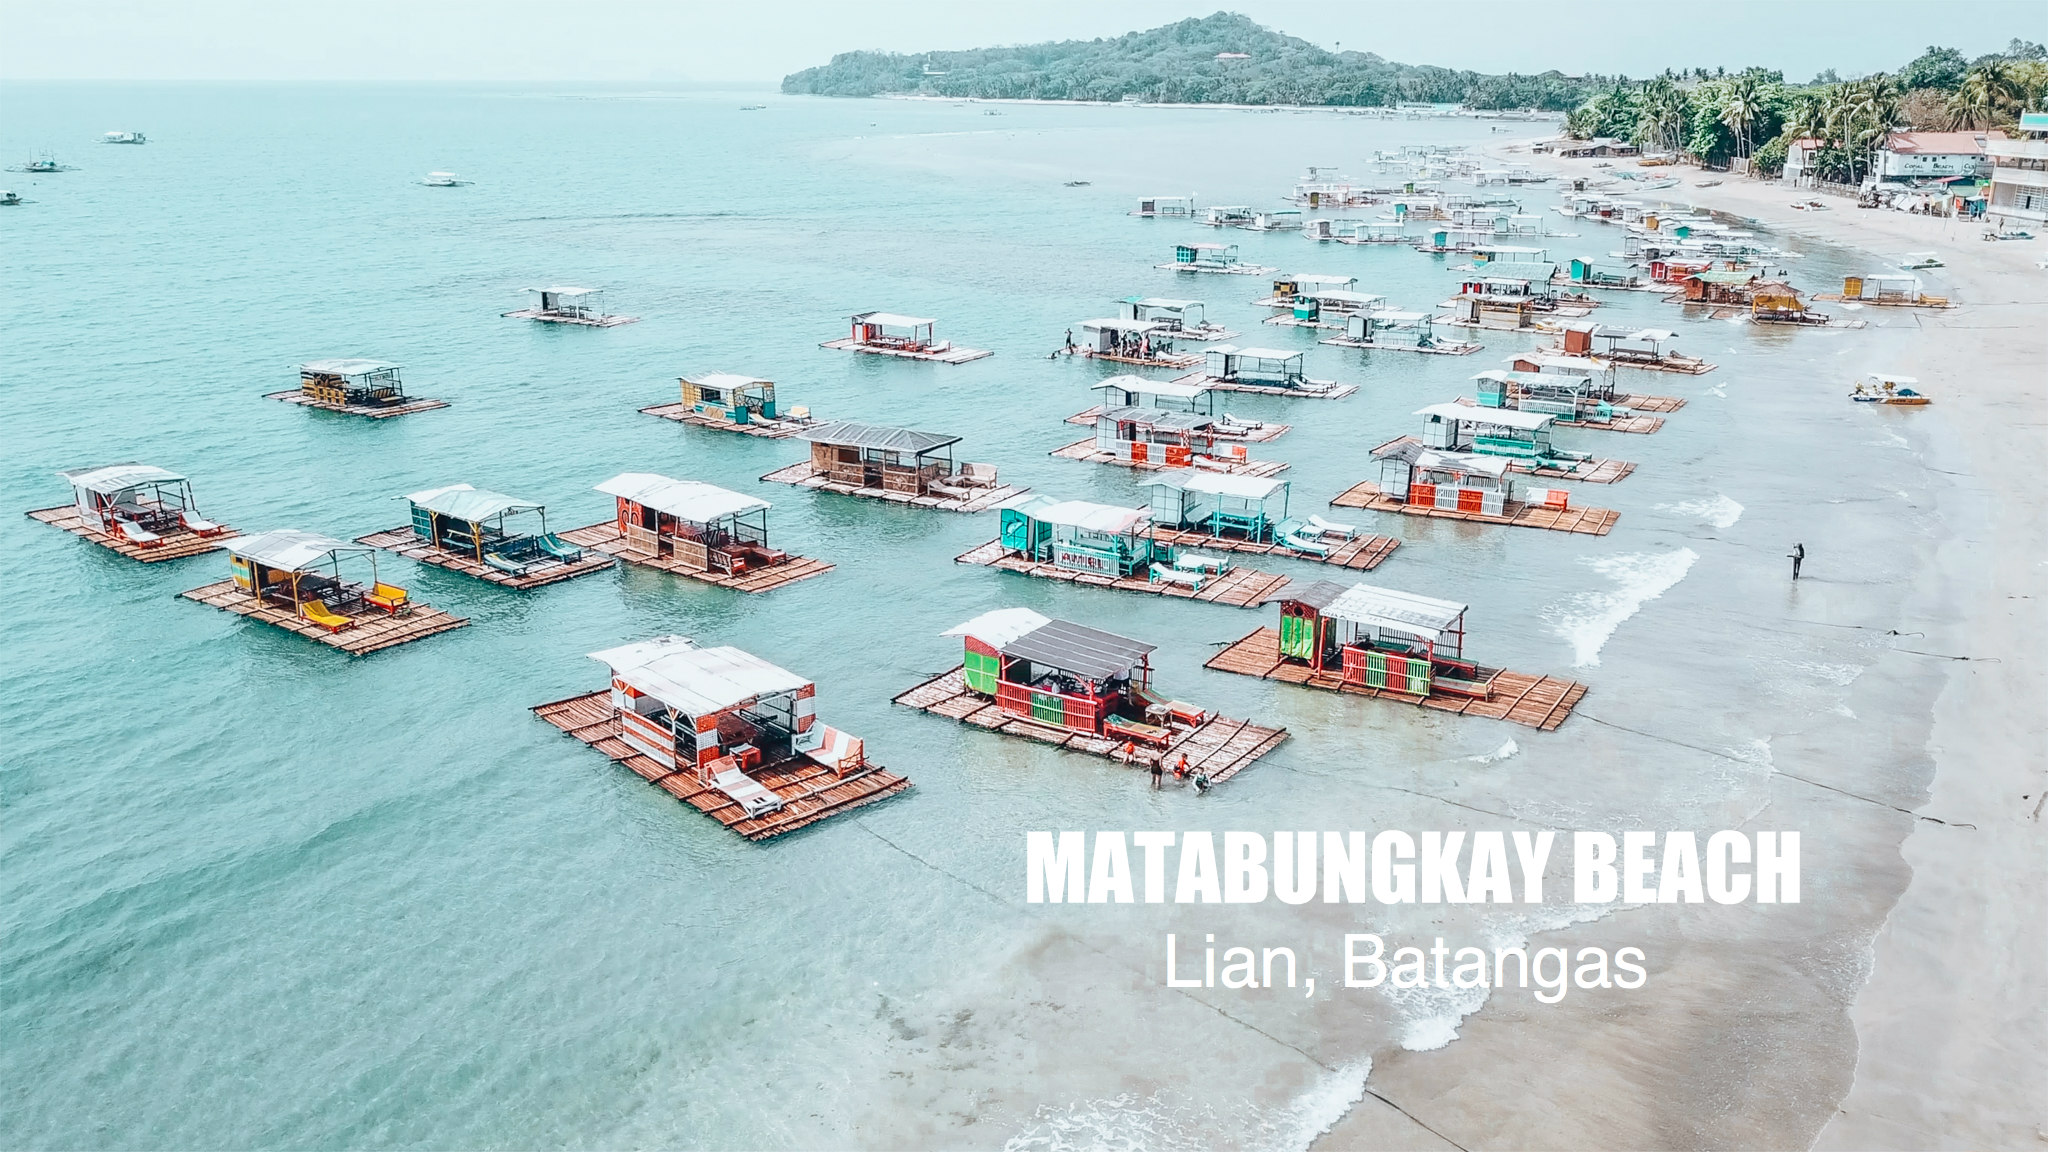 Matabungkay Beach Batangas: How to get there